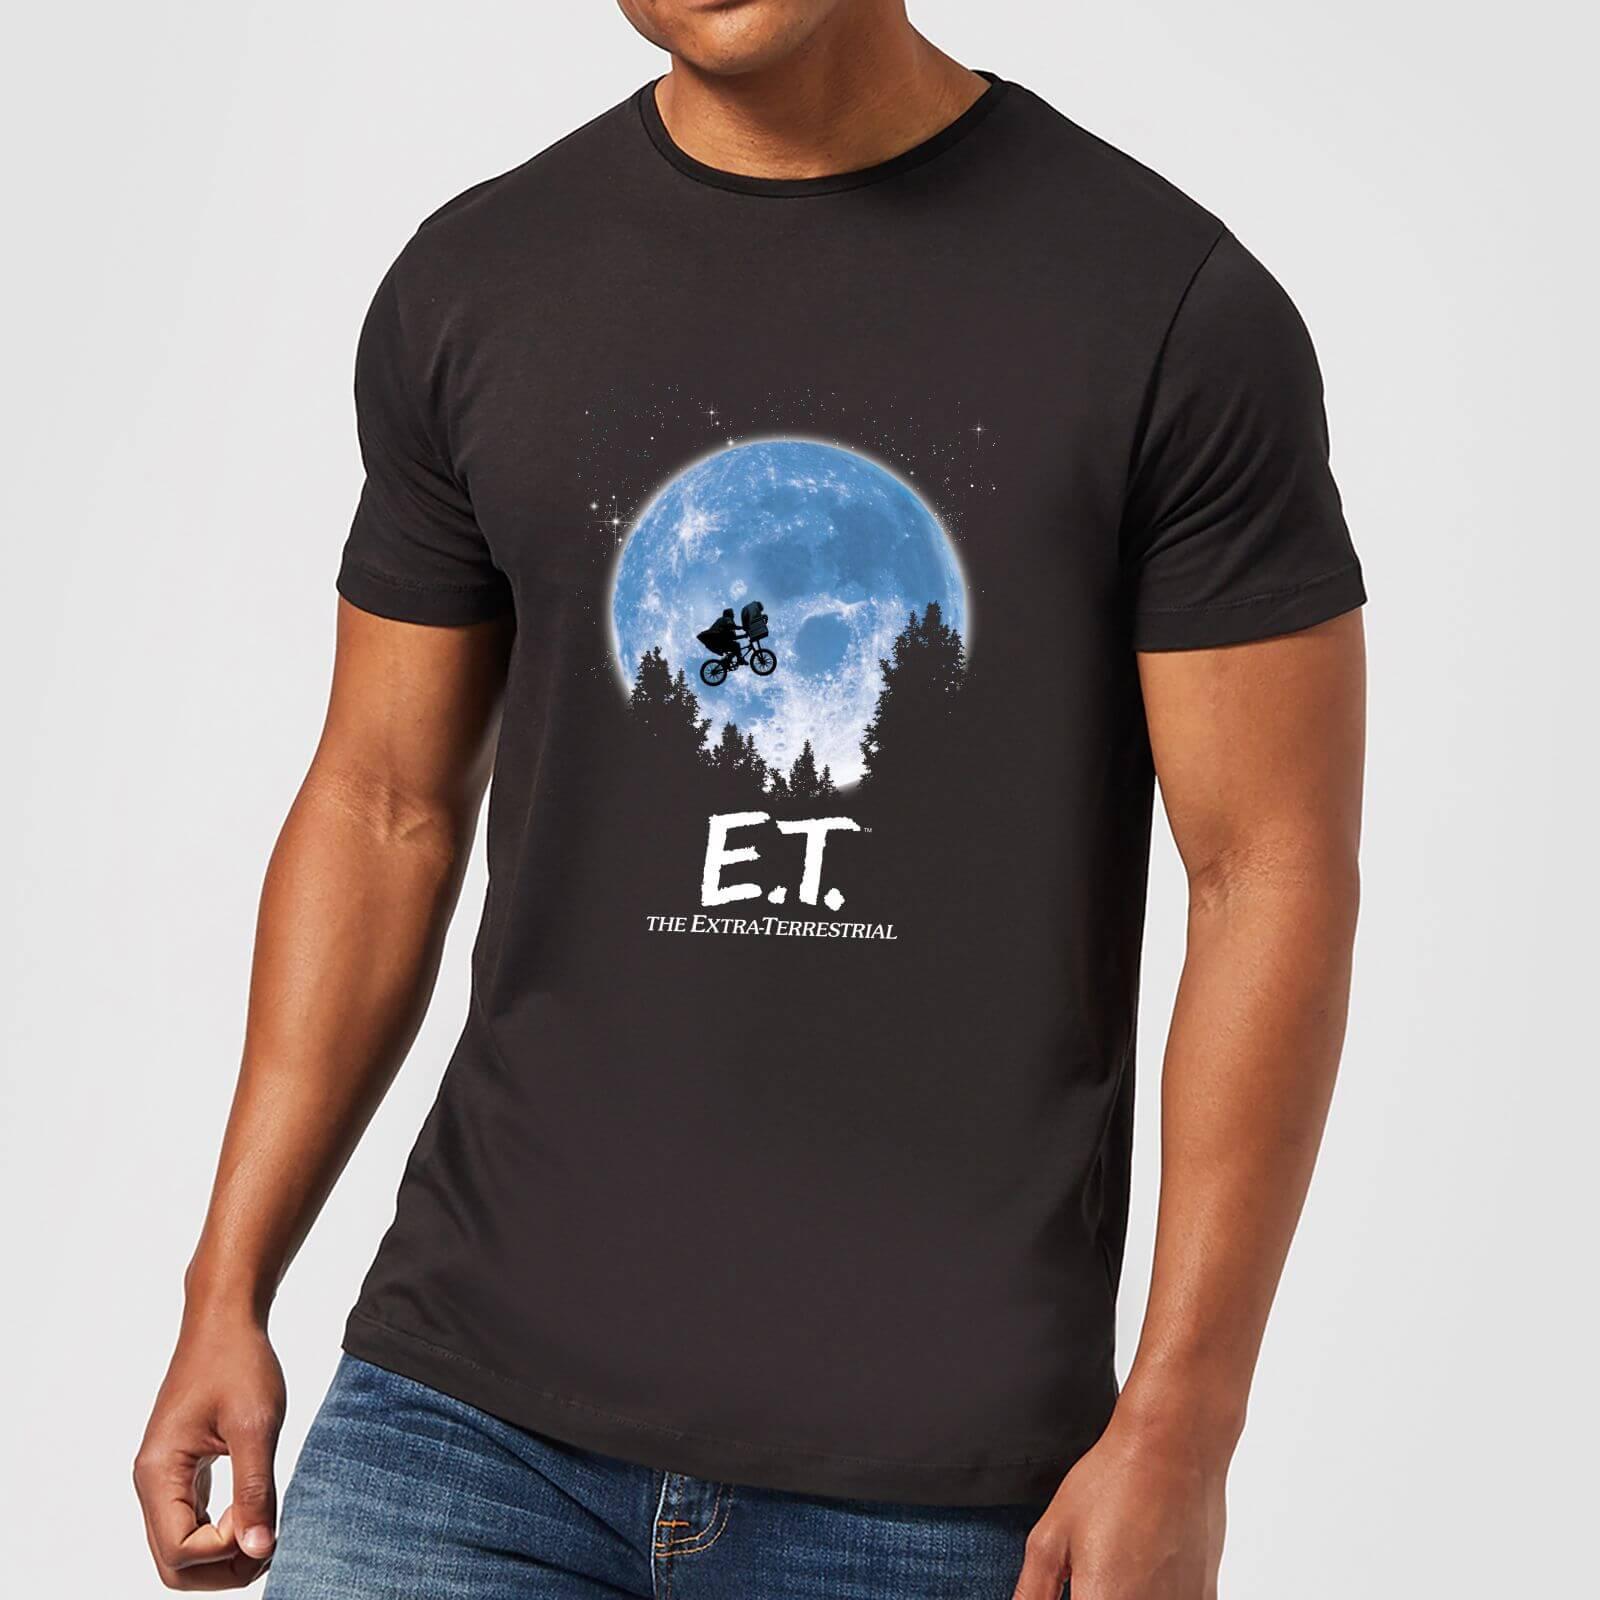 b30419d8 ET Moon Silhouette T-Shirt - Black Clothing | Zavvi